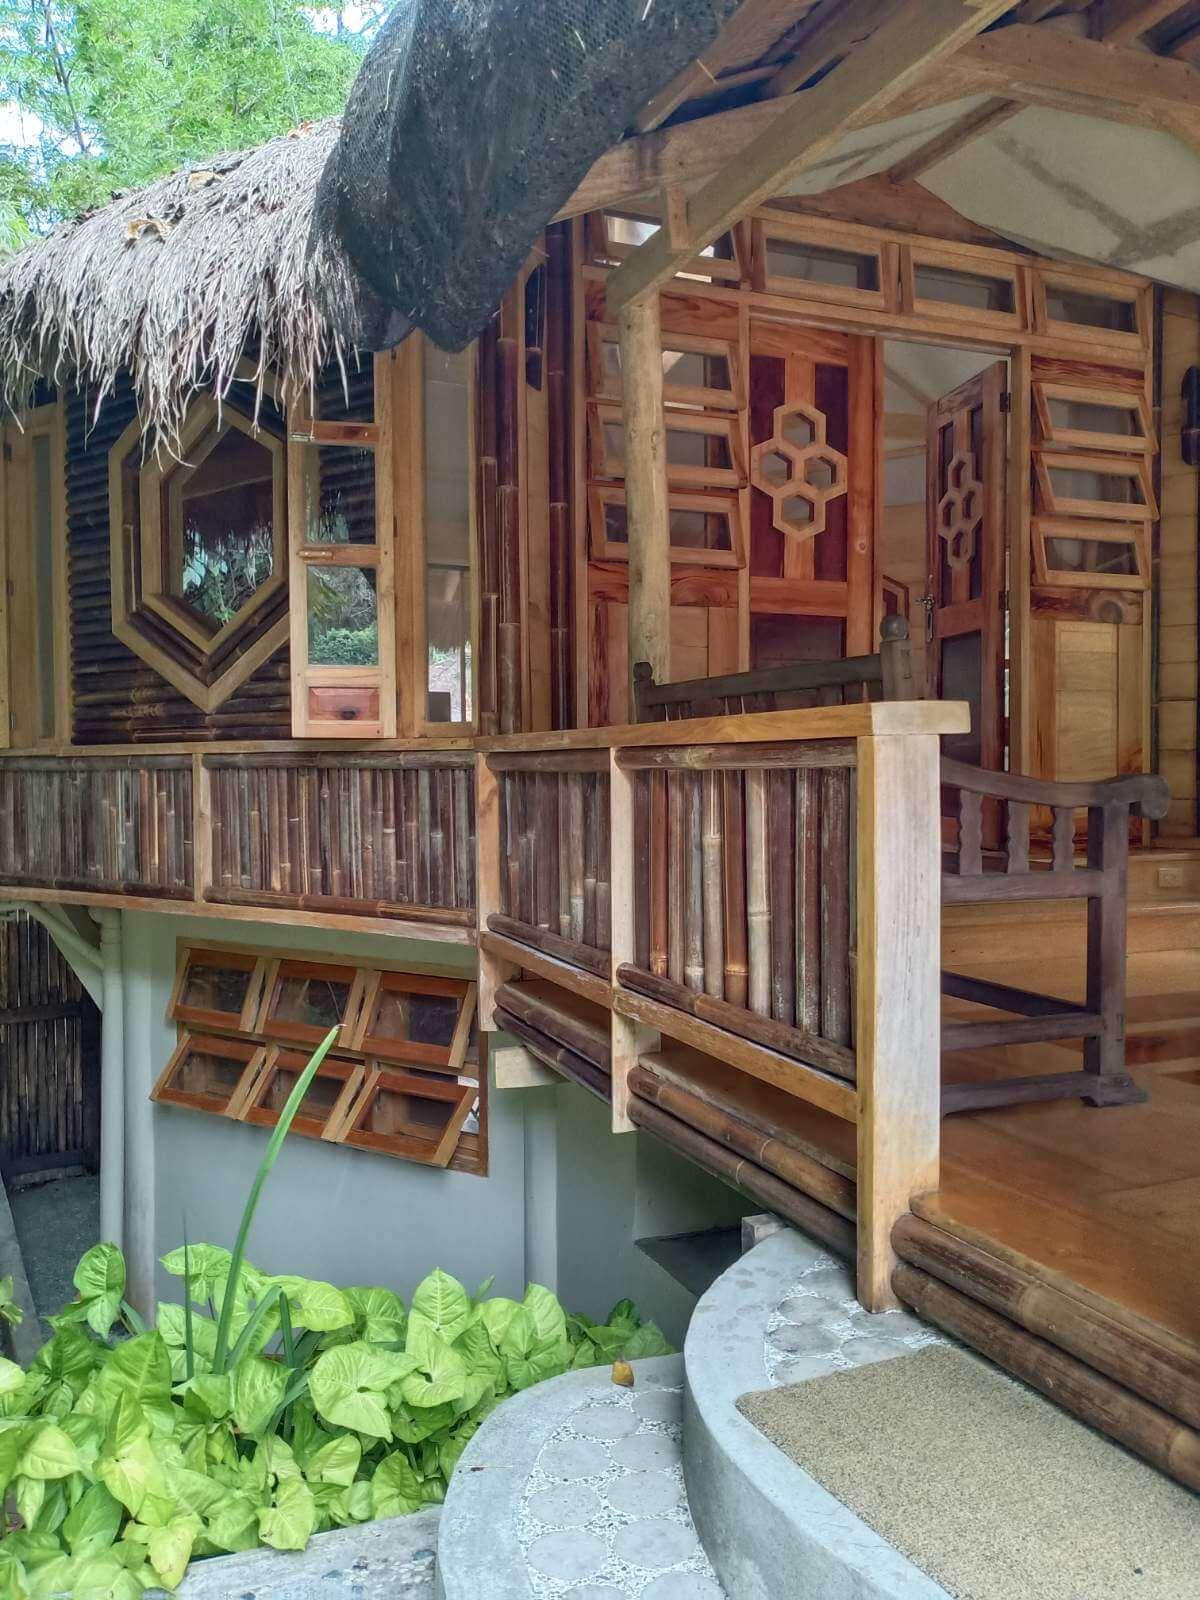 Lotus Valley Farm La Union - Bamboo Huts